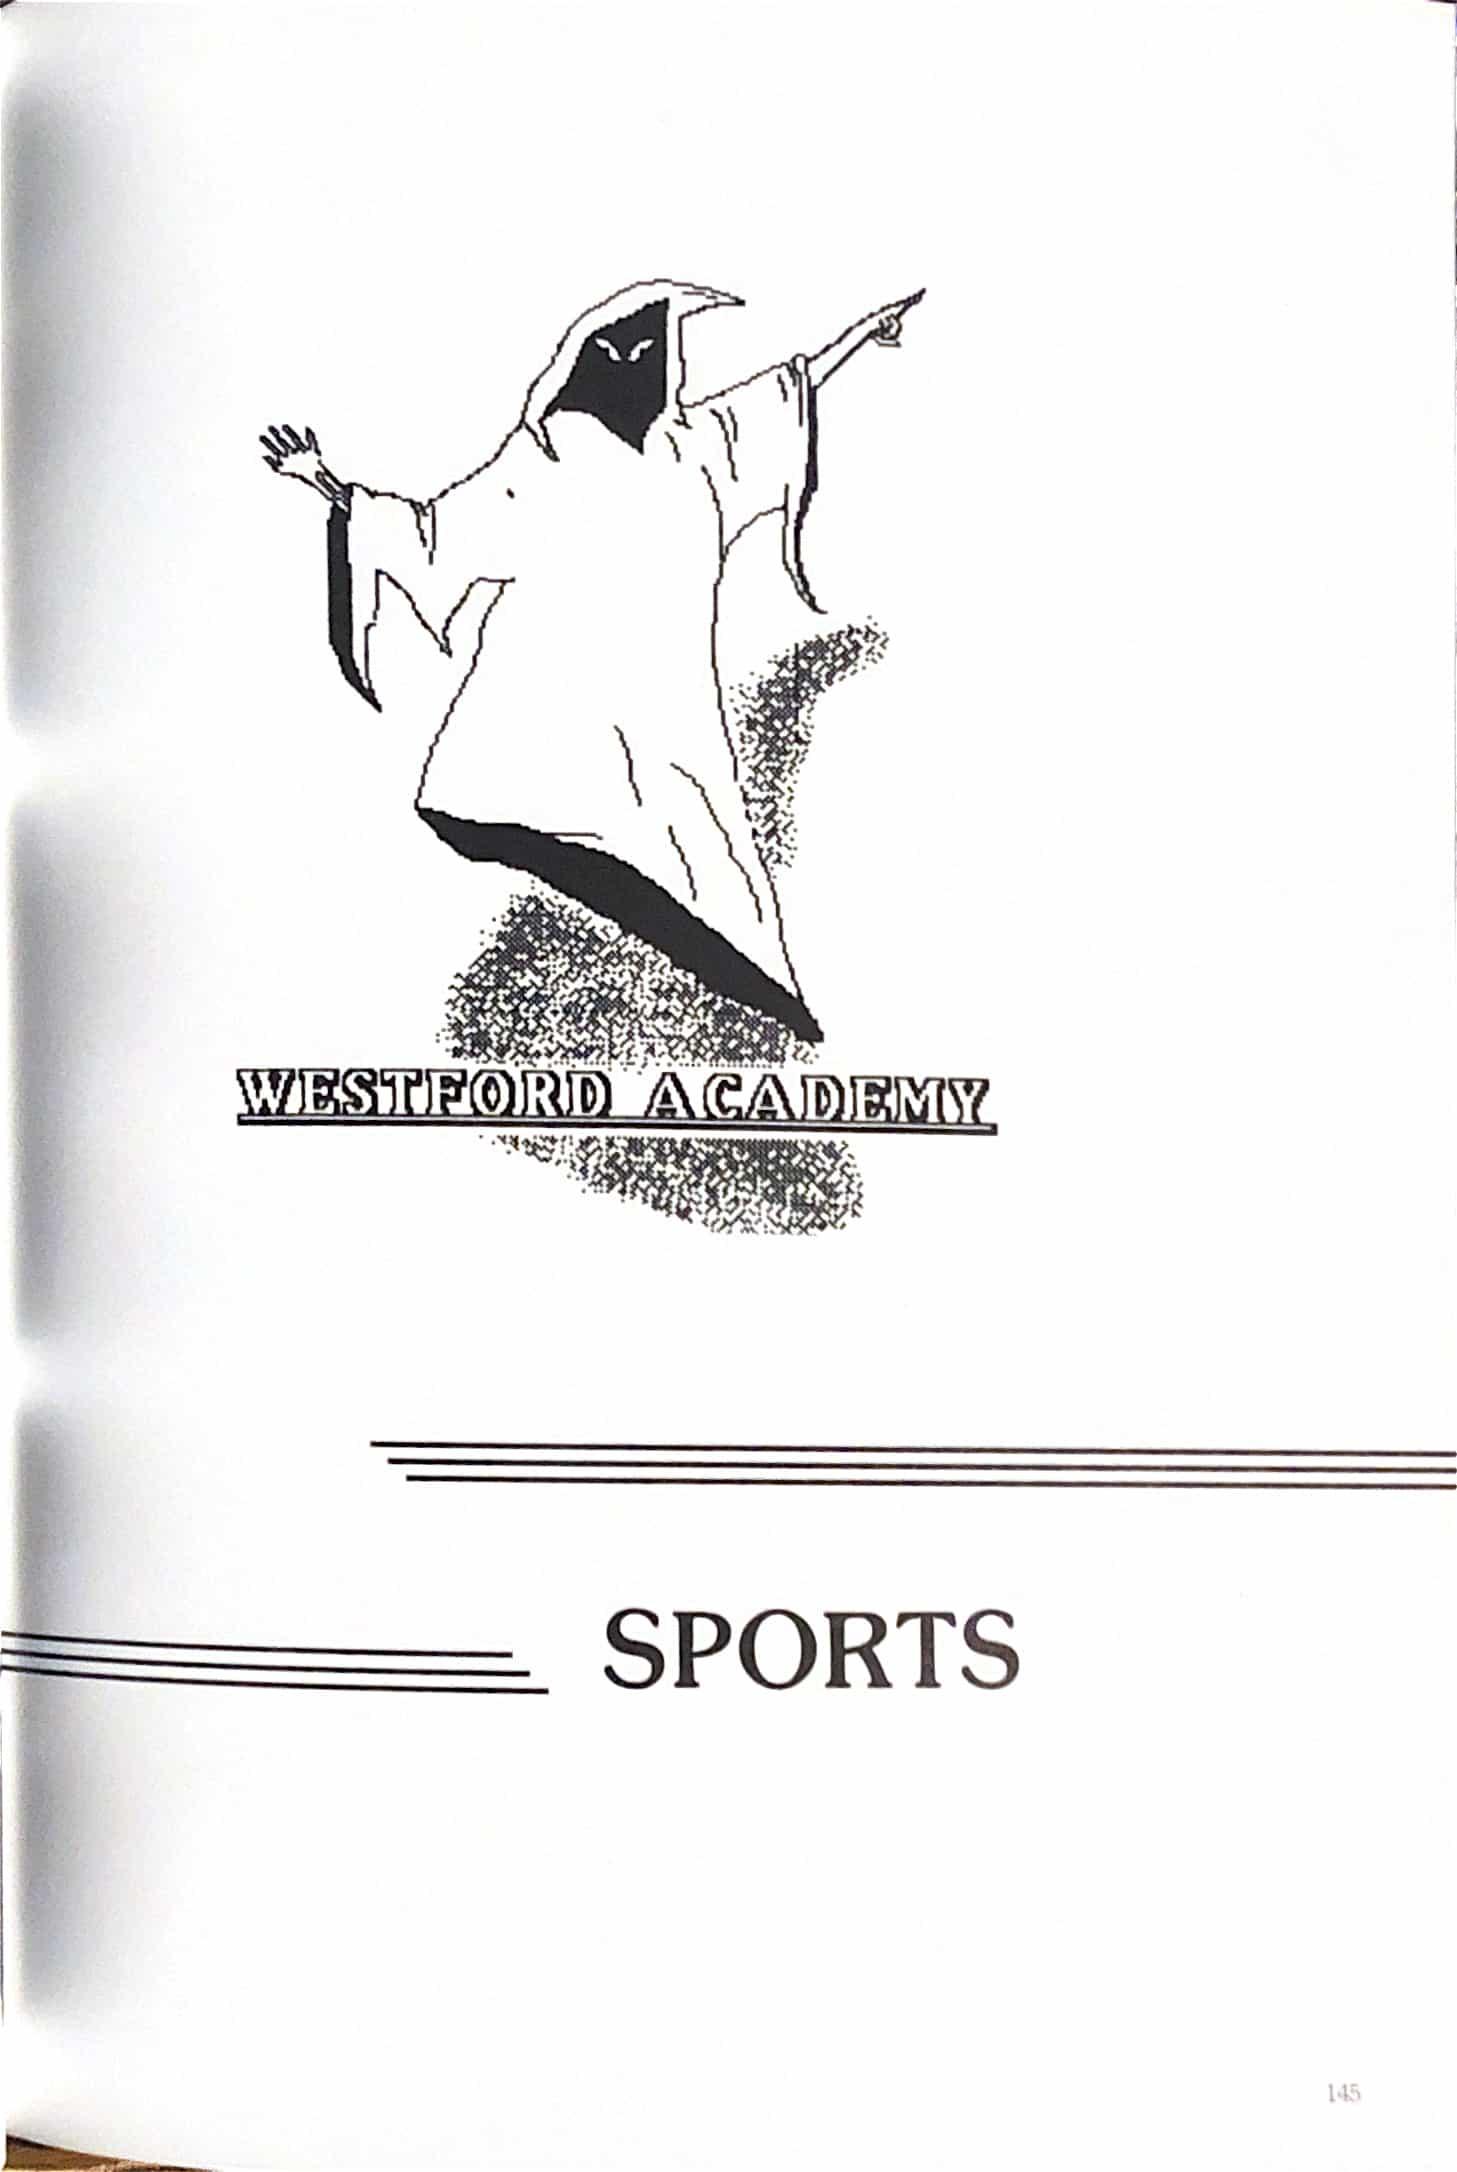 1987 Yearbook Interior